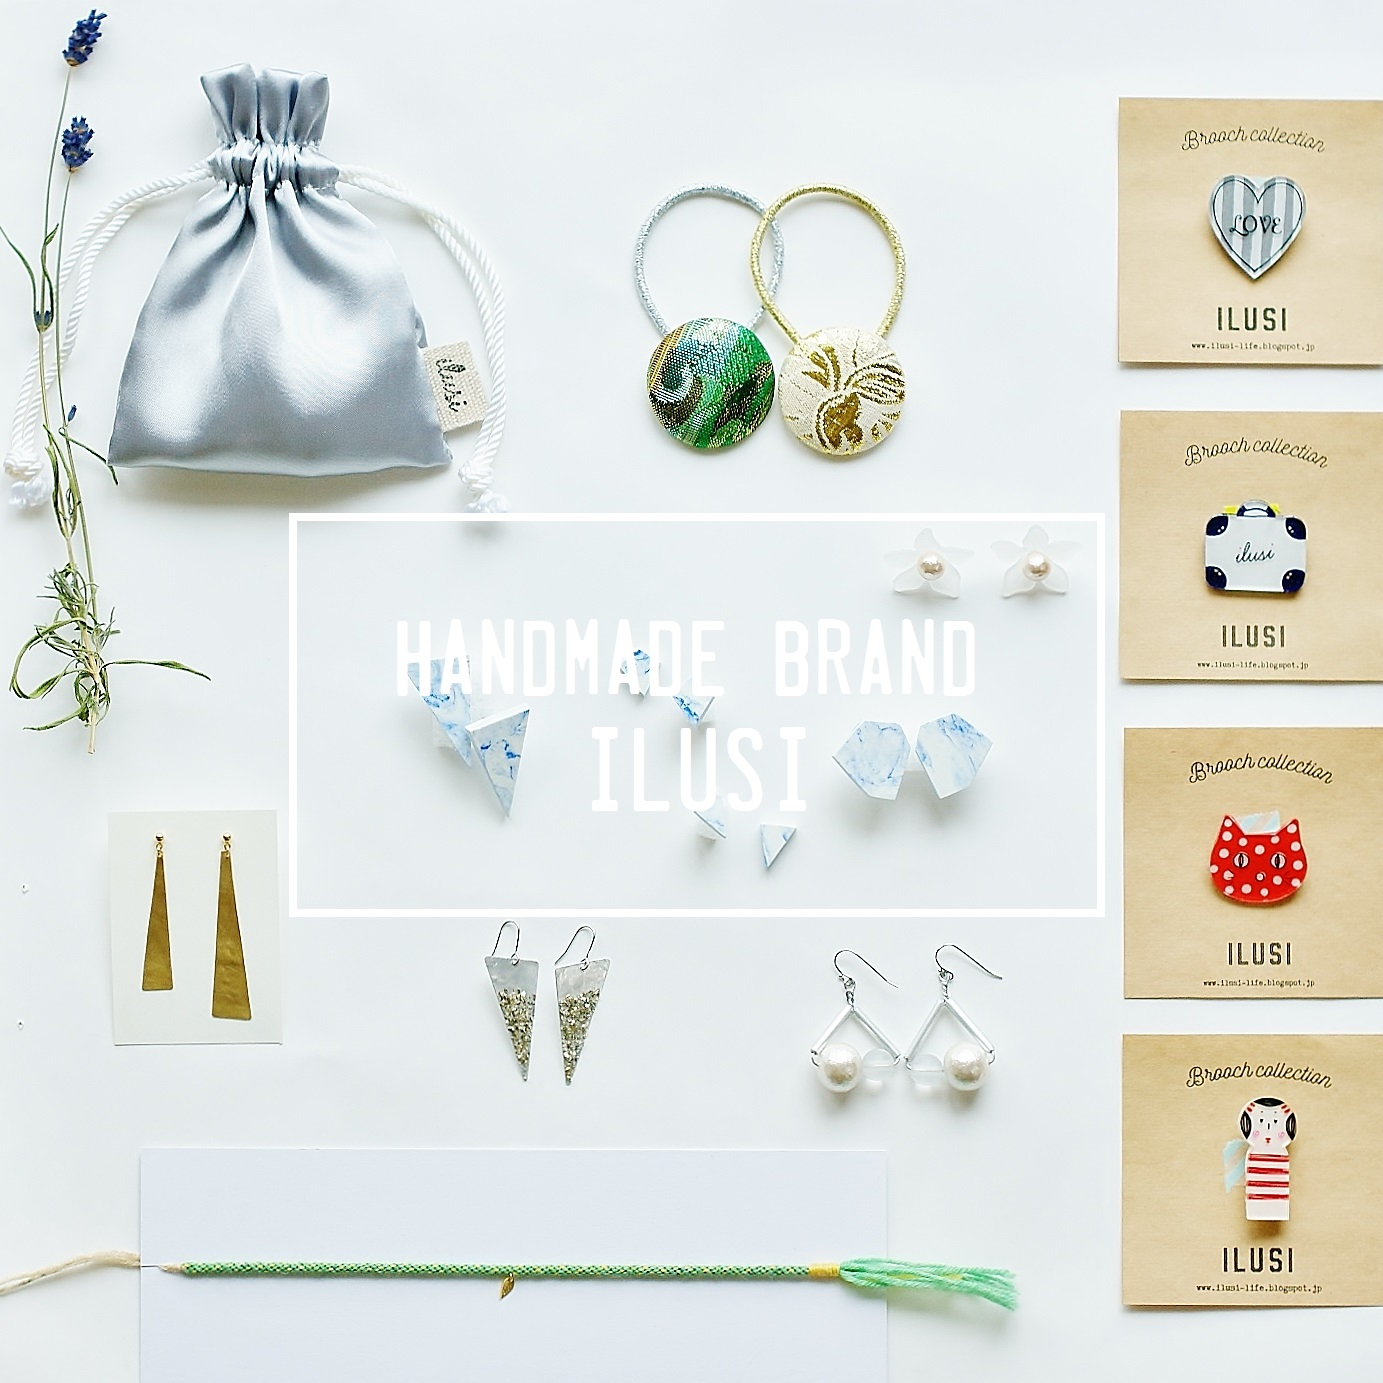 handmade brand ilusi